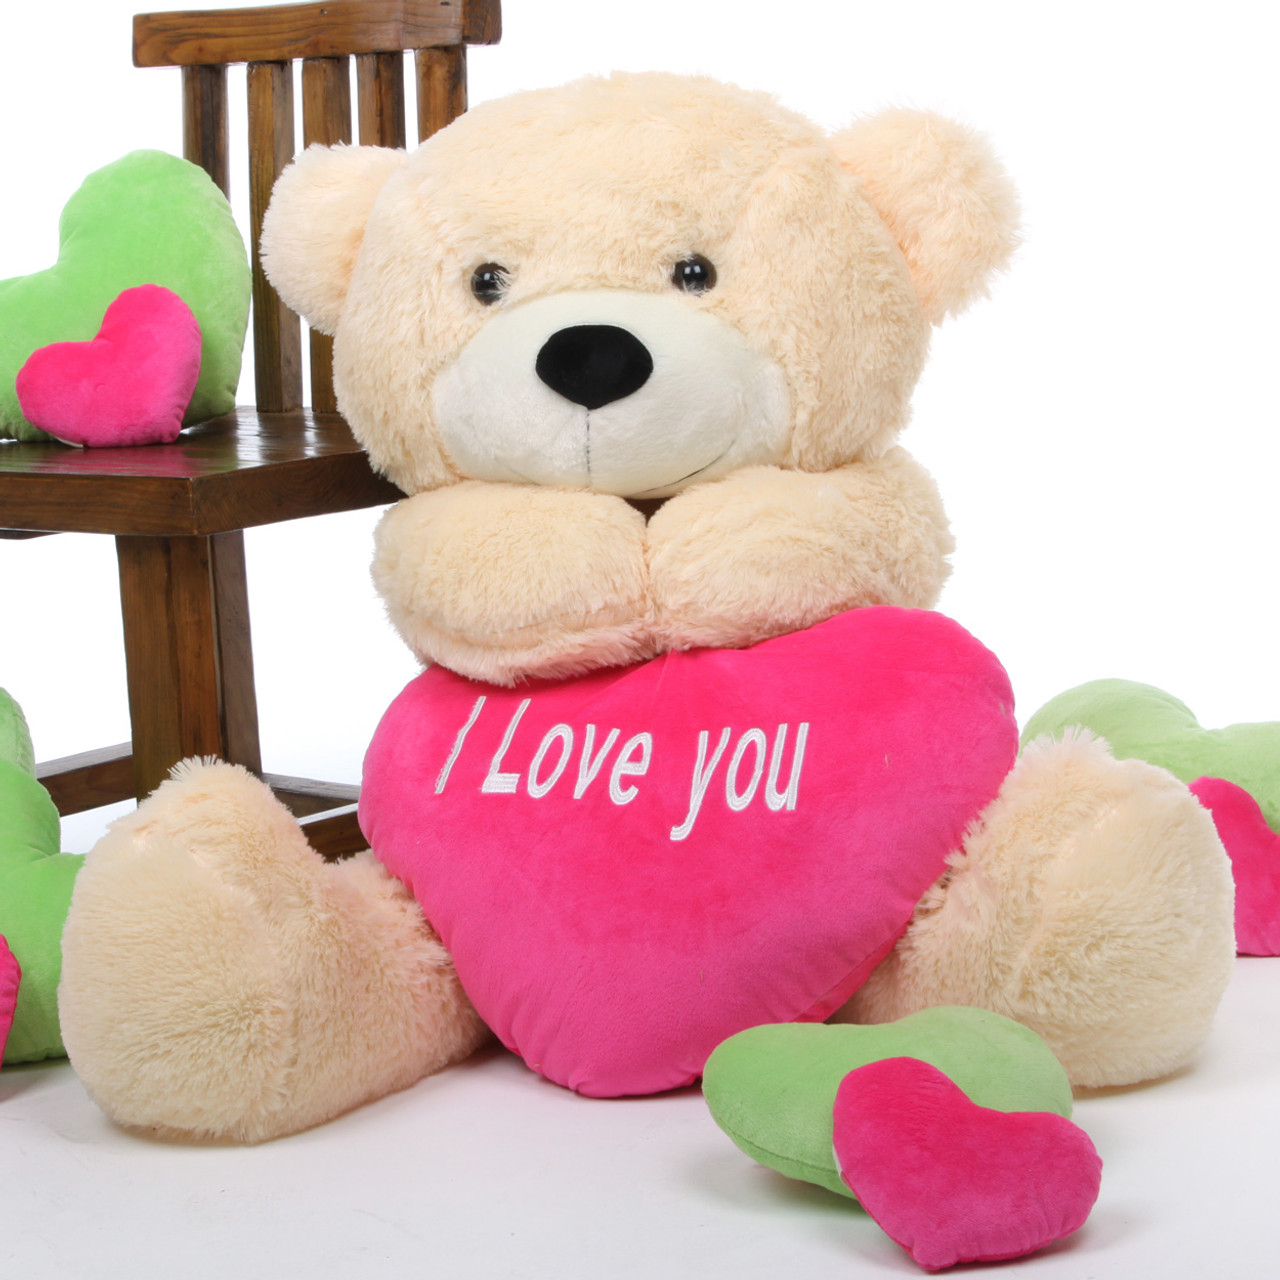 Cozy love cuddles 38 cream teddy bear w i love you heart giant cozy love cuddles cream teddy bear with heart 38in altavistaventures Images